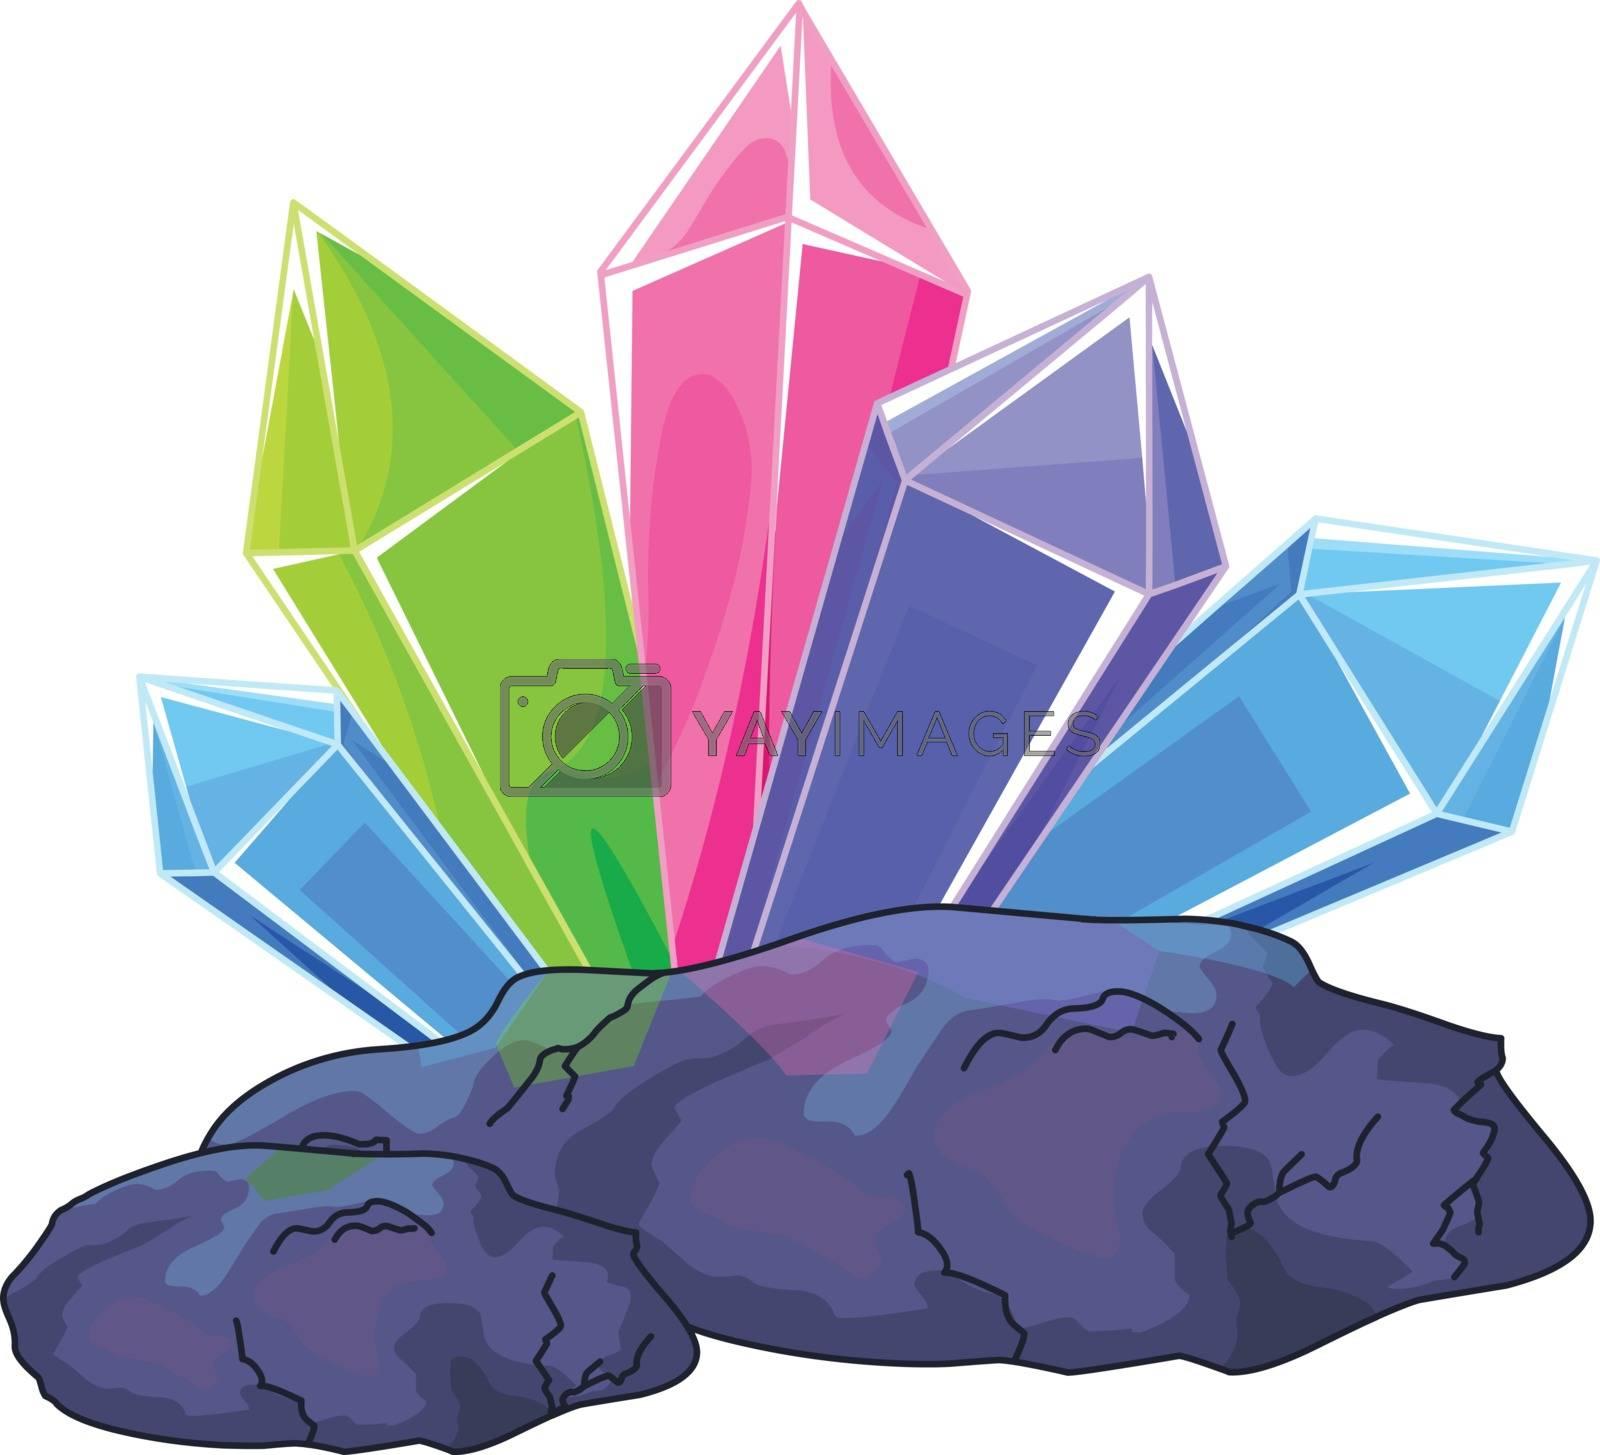 Royalty free image of Quartz crystal by Dazdraperma